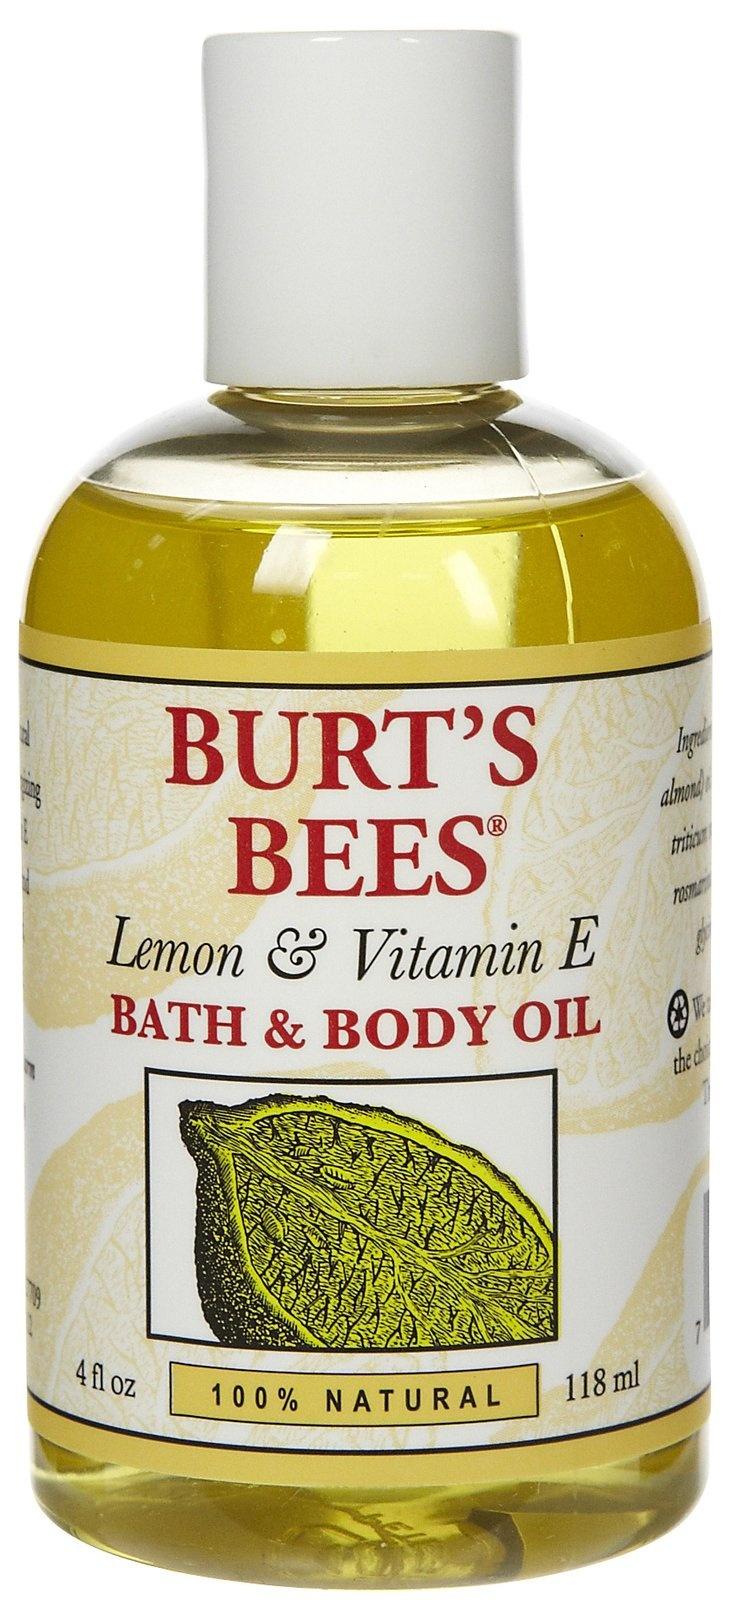 Burt's Bees Bath & Body Oil with Lemon & Vitamin E